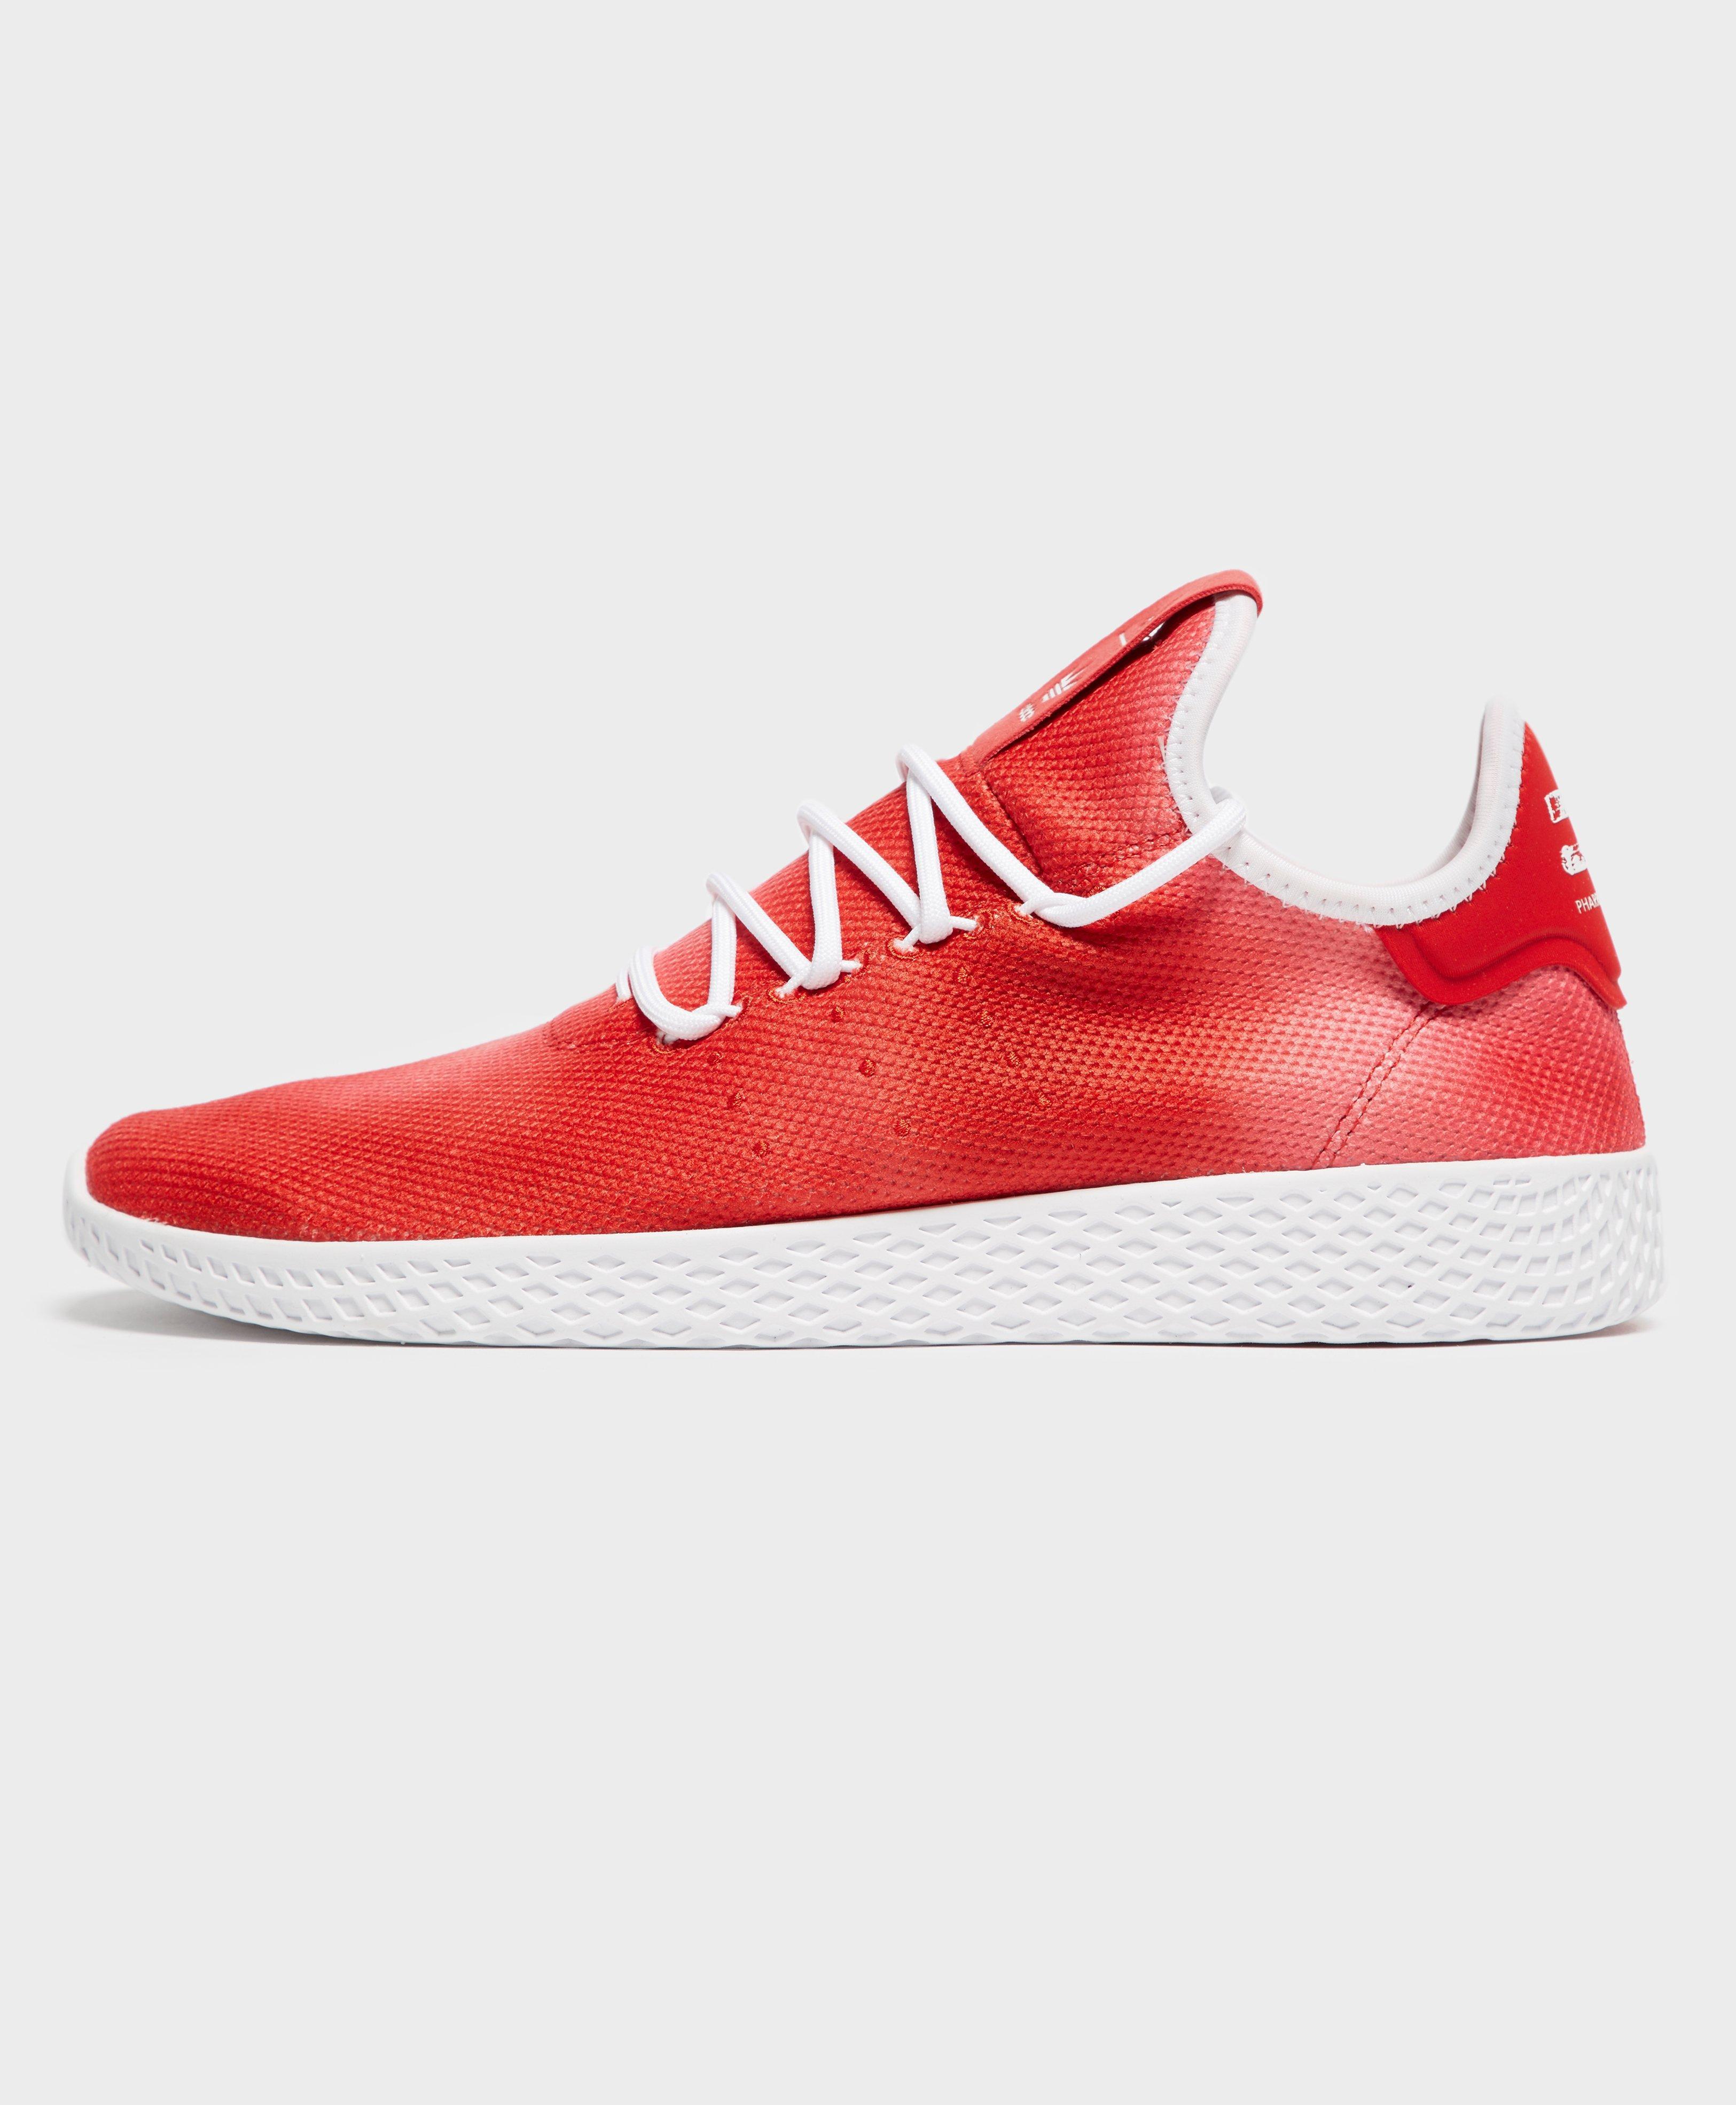 adidas OriginalsPW TENNIS HU - Trainers - footwear white/collegiate burgundy sTZCra